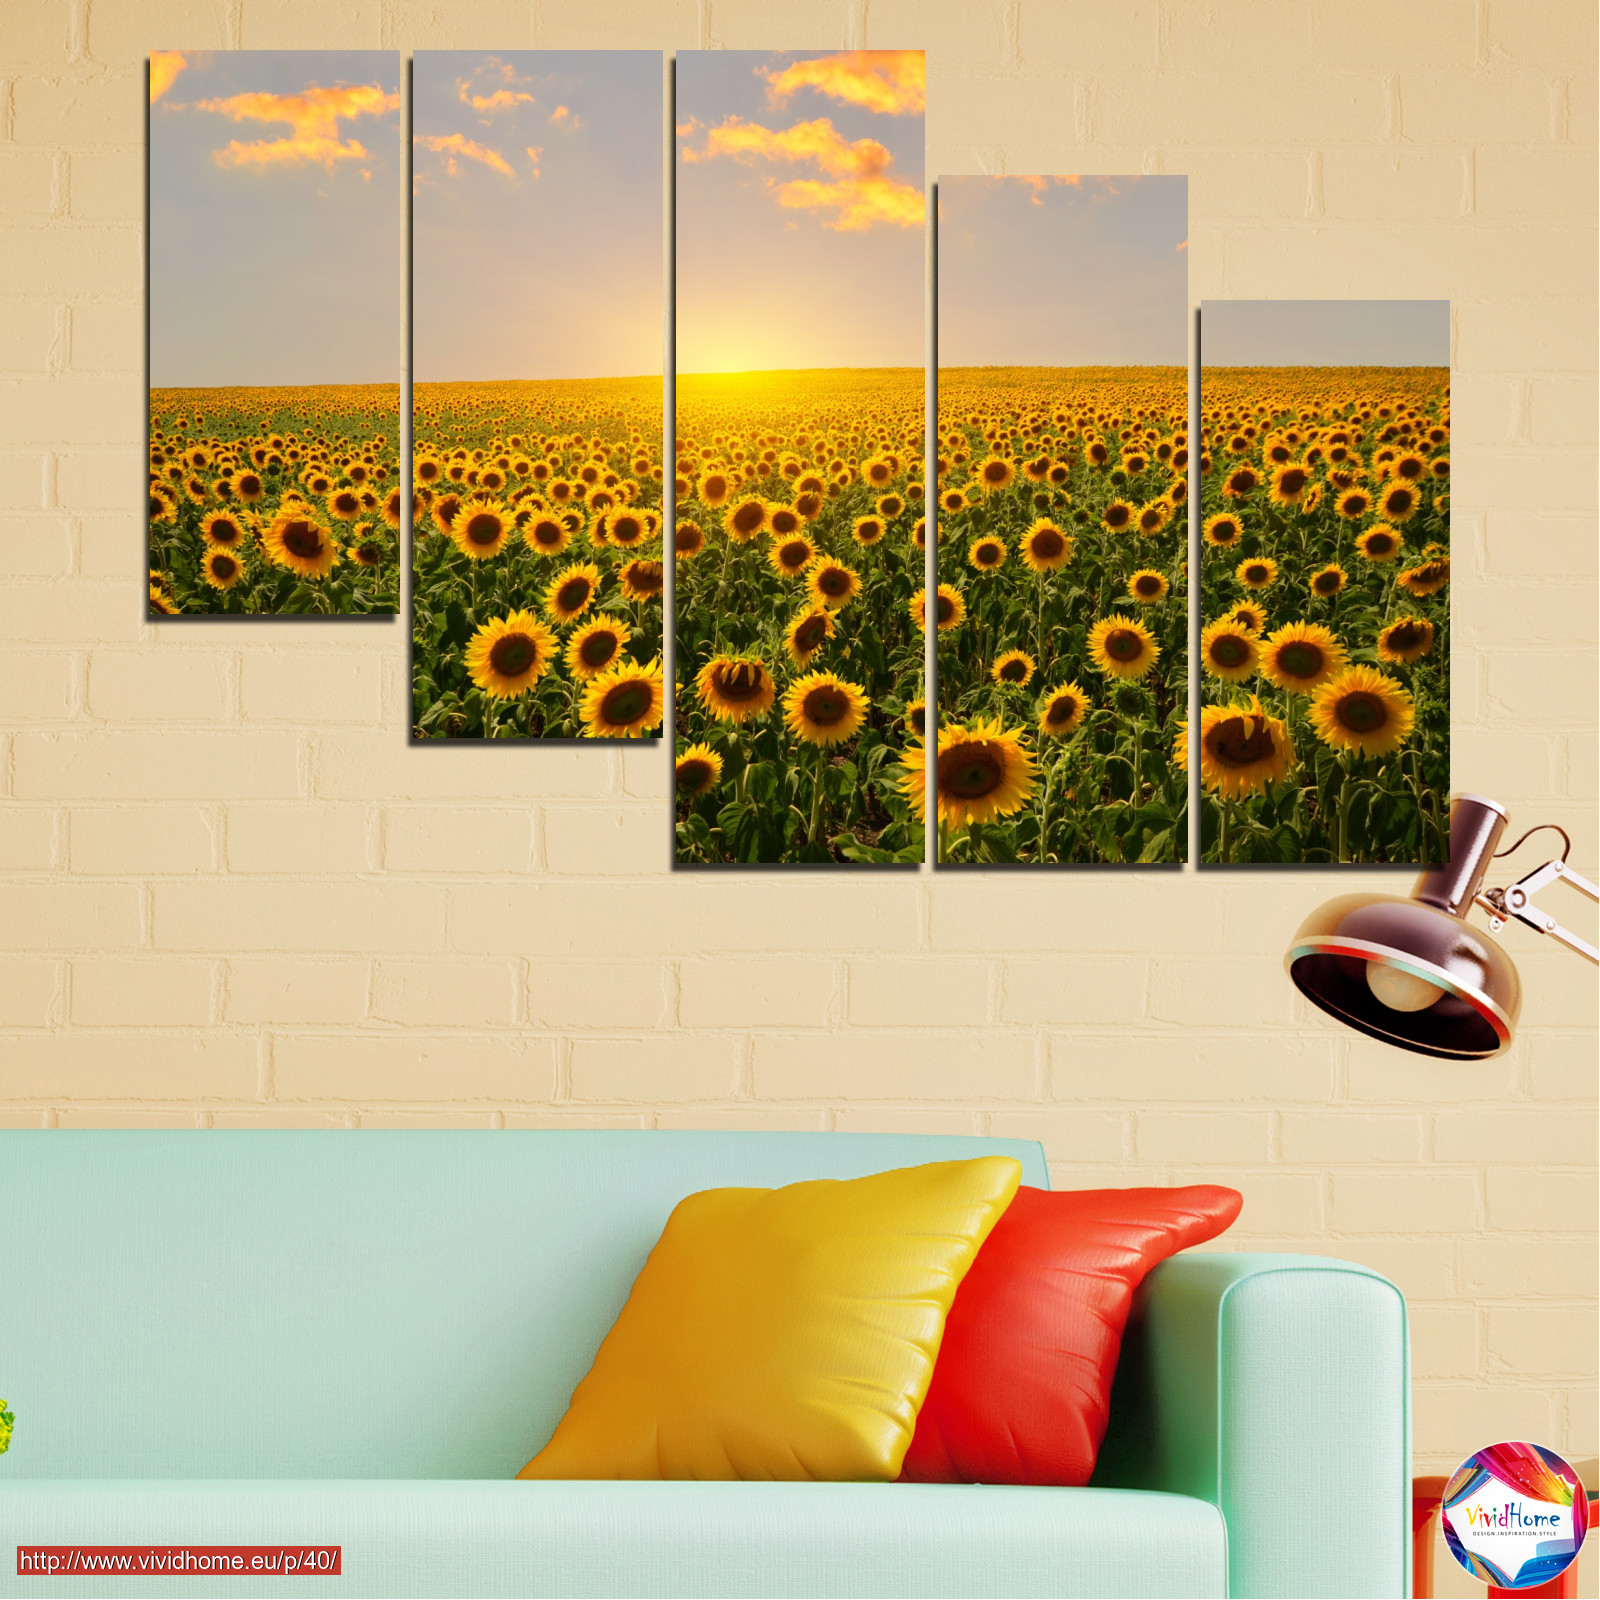 Flowers, Nature, Sun, Sky, Sunflower, Field №0040